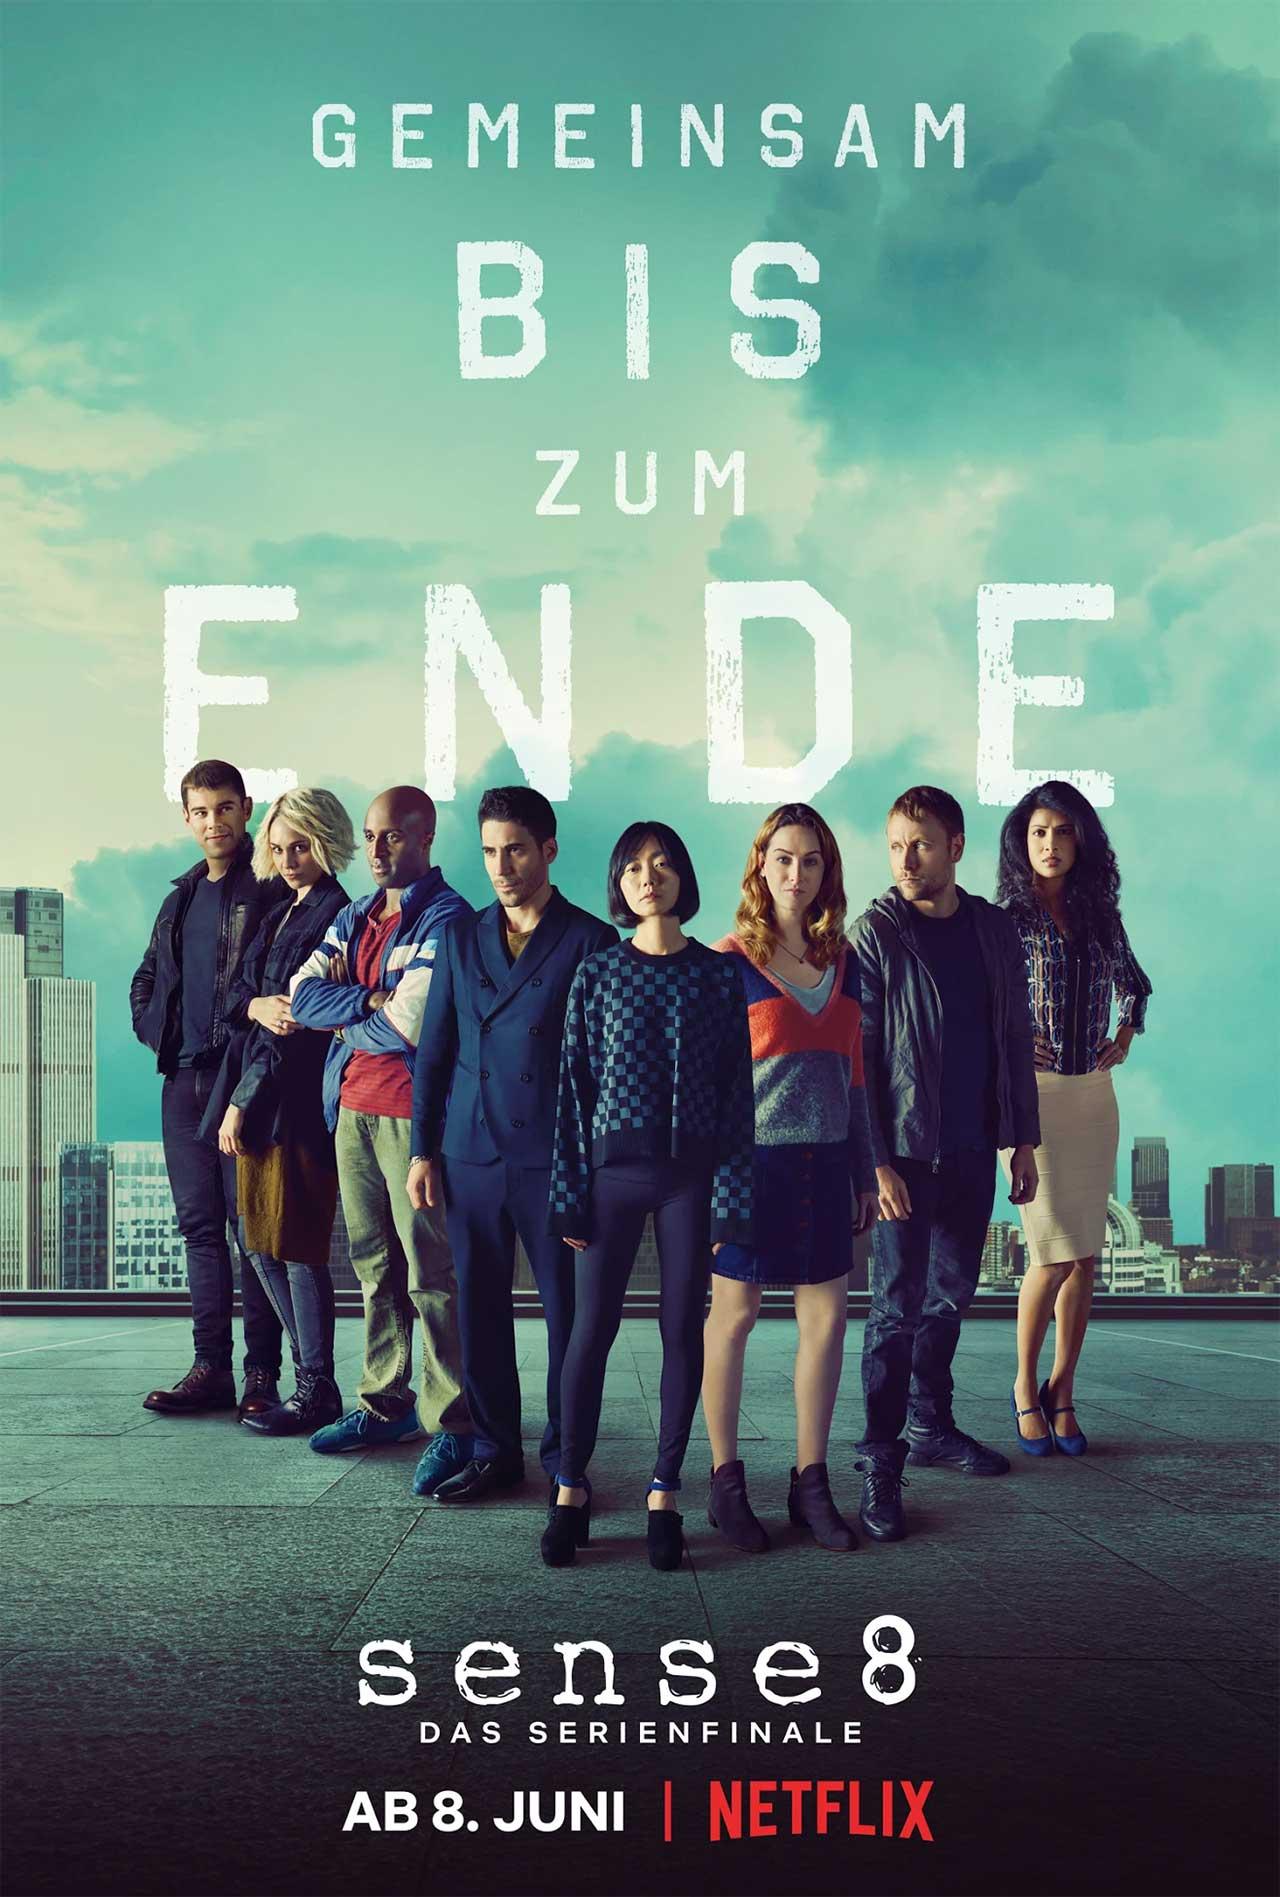 sense8-serienfinale-poster_BIG Sense8: Serienfinale ab 8. Juni auf Netflix